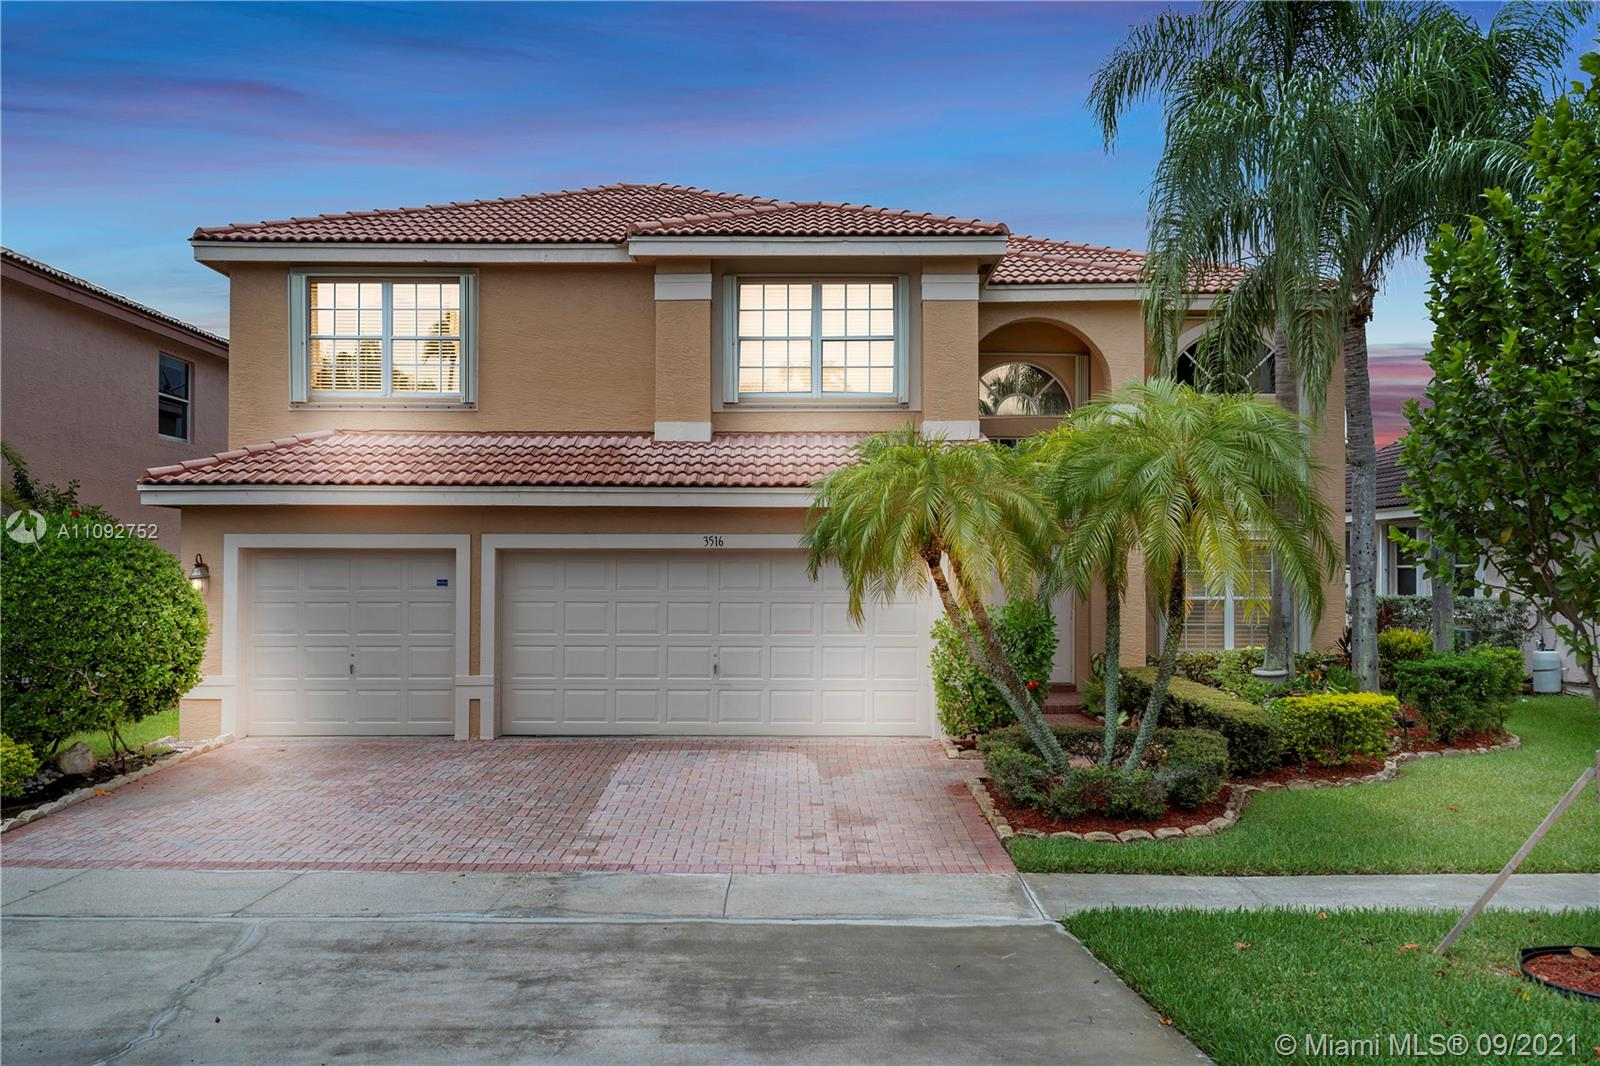 3516 174th Dr, Miramar, Florida 33029